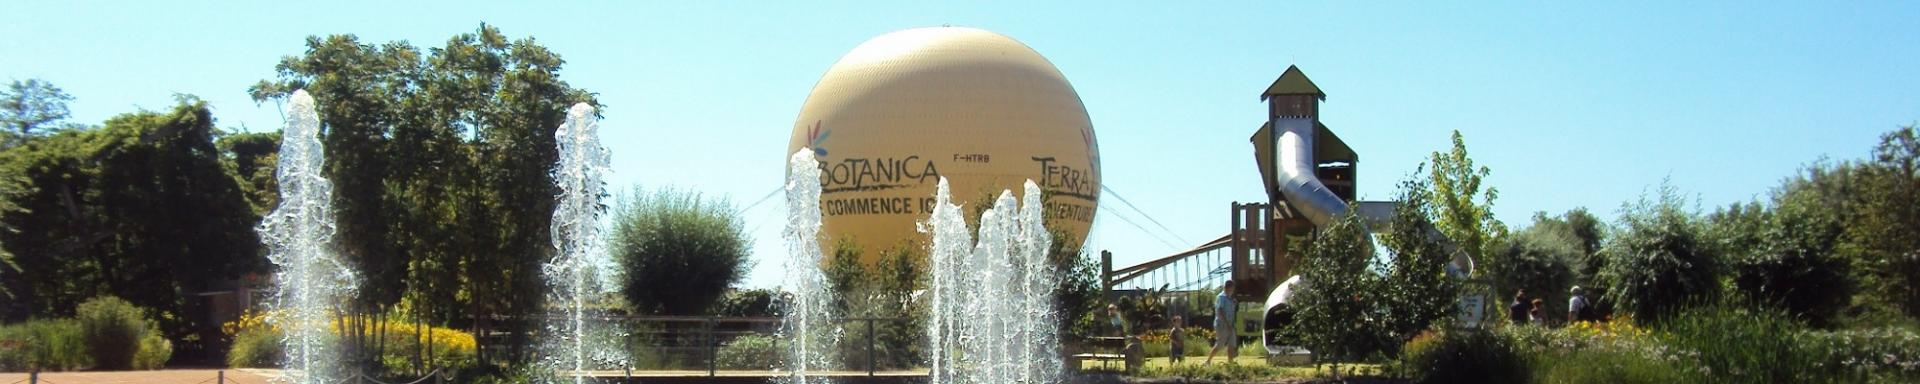 Photos de la visite de TERRA-BOTANICA